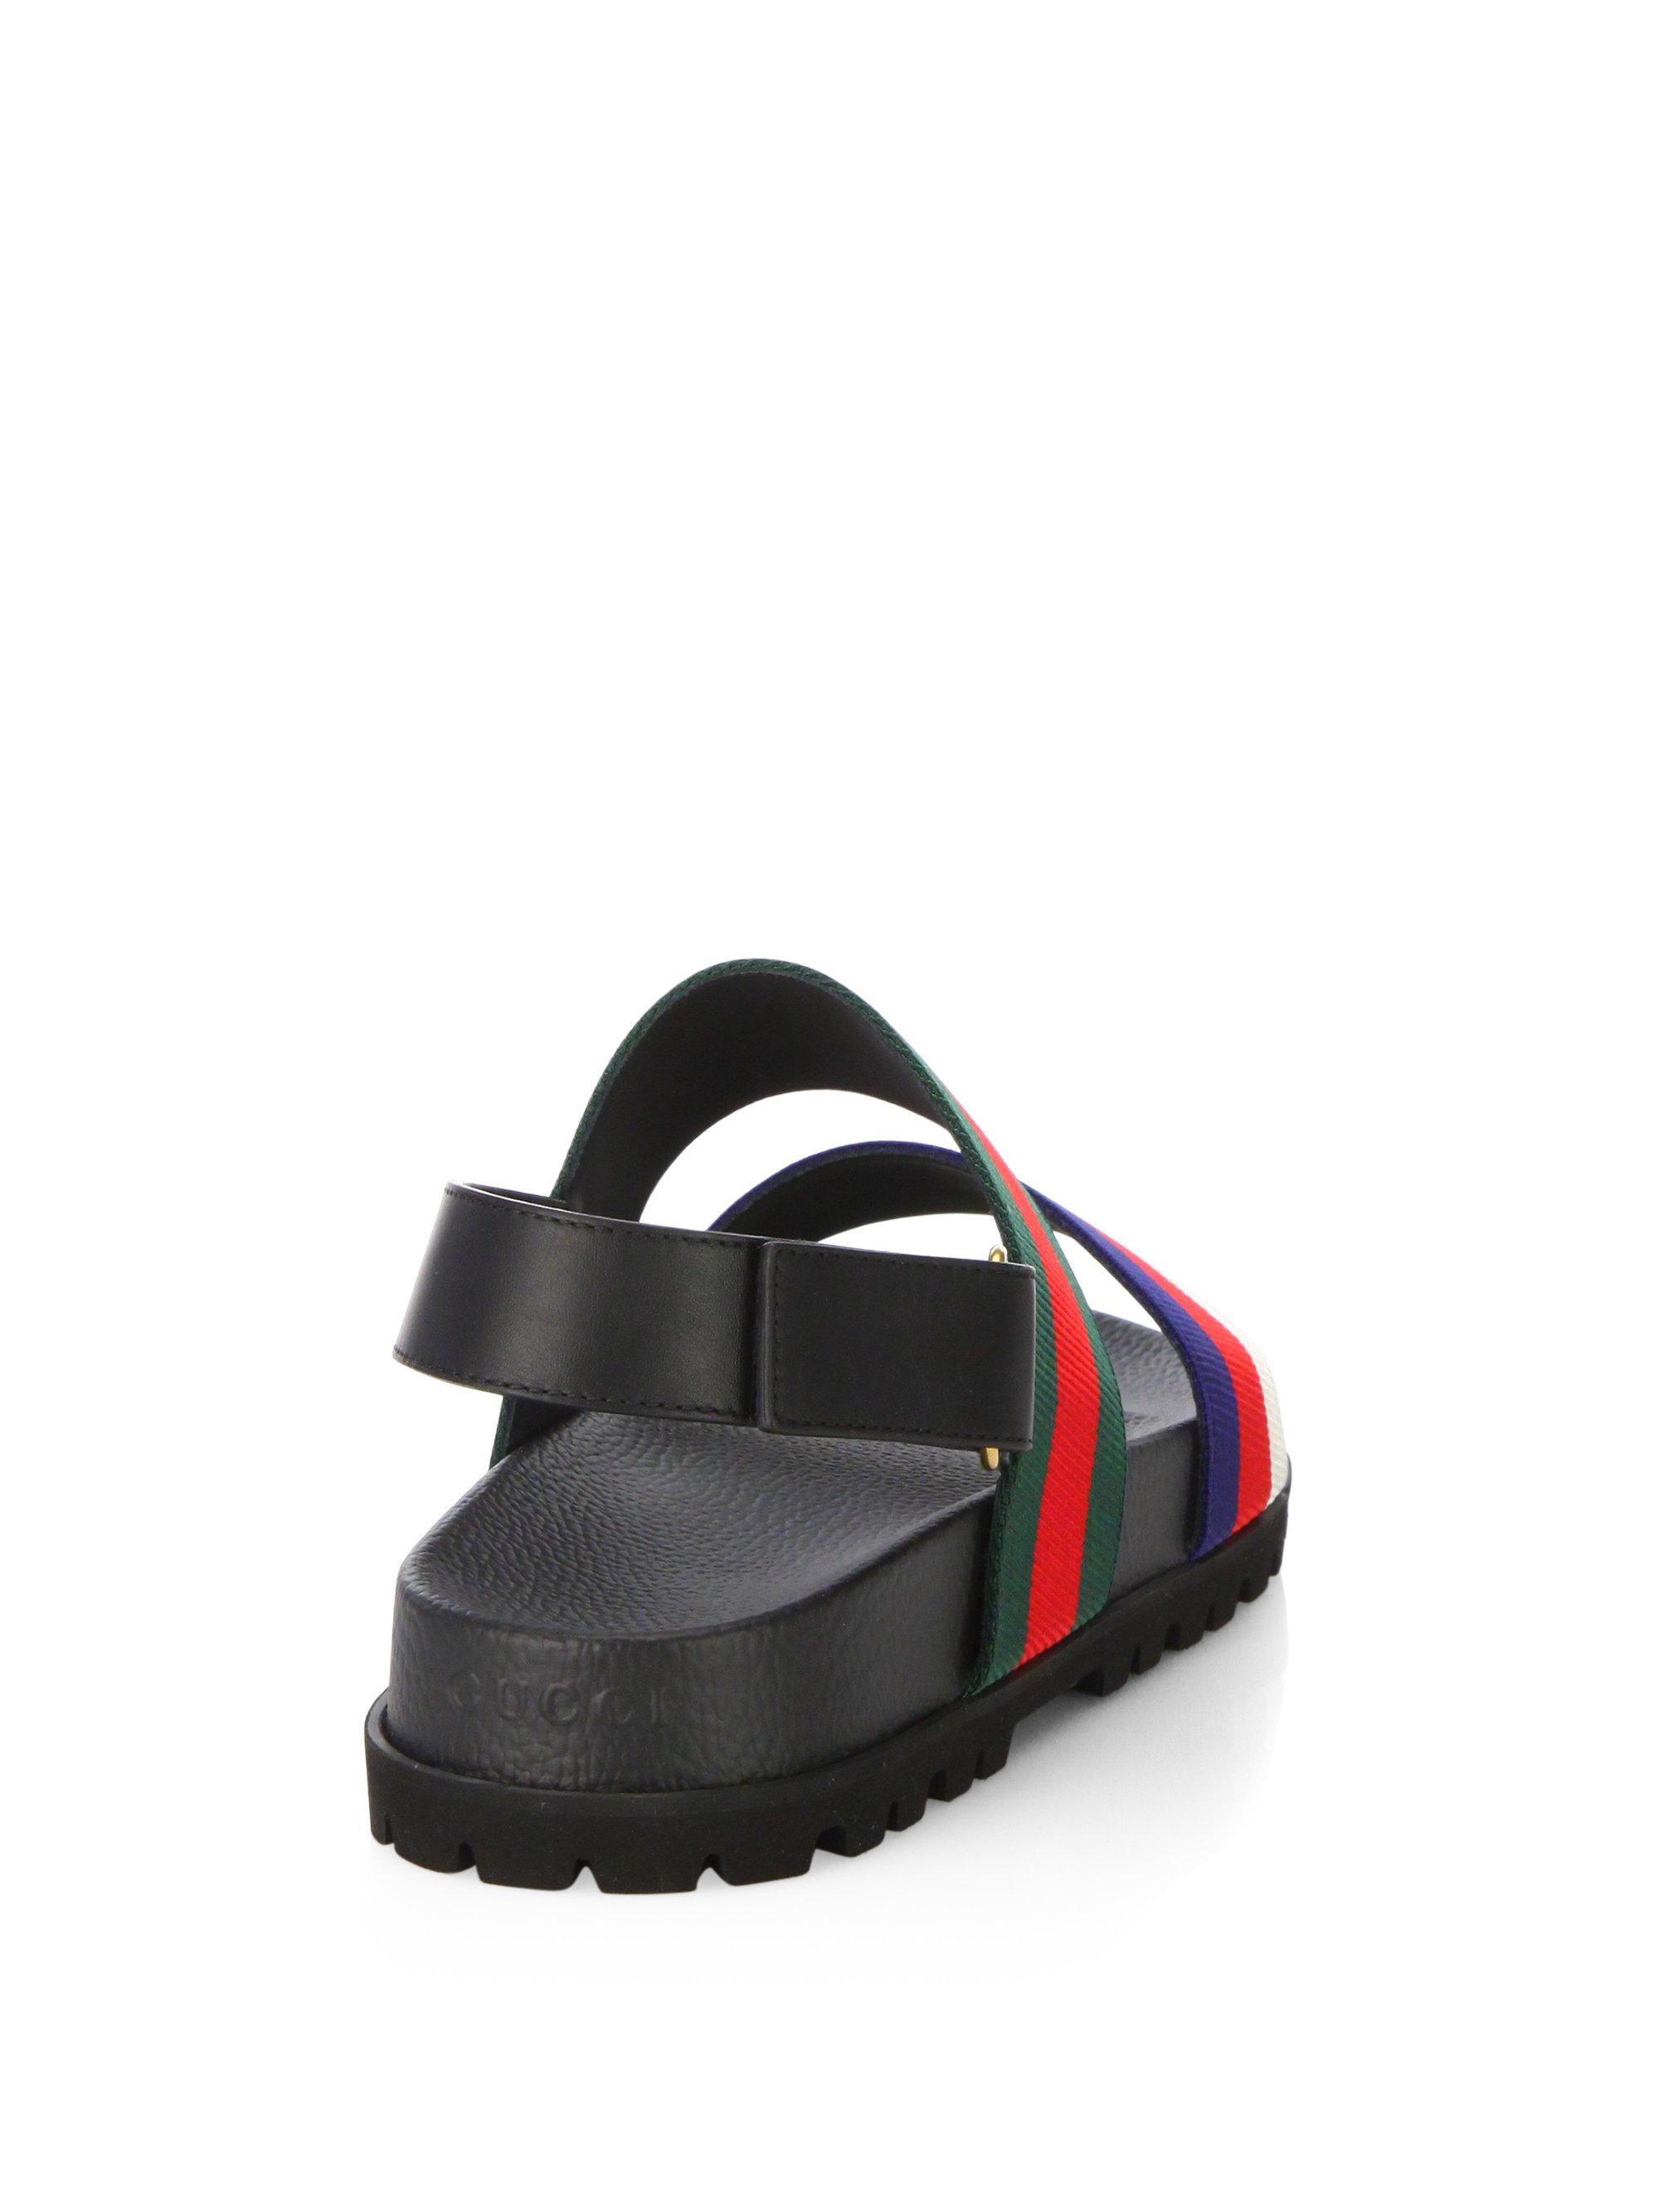 Gucci Rimini Leather Double Strap Sandals Lyst